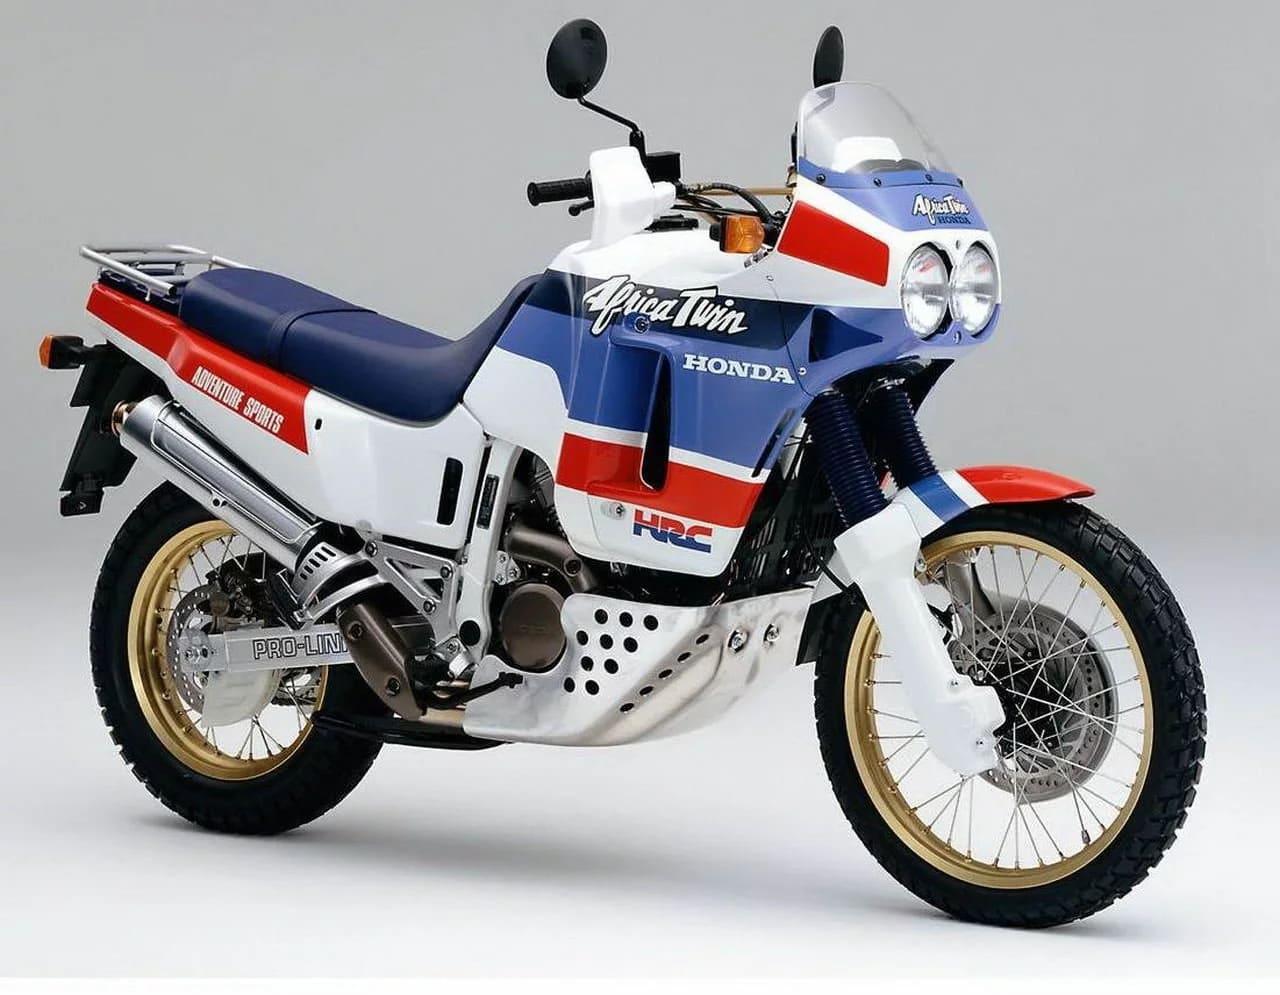 The original Honda Africa Twin XRV750